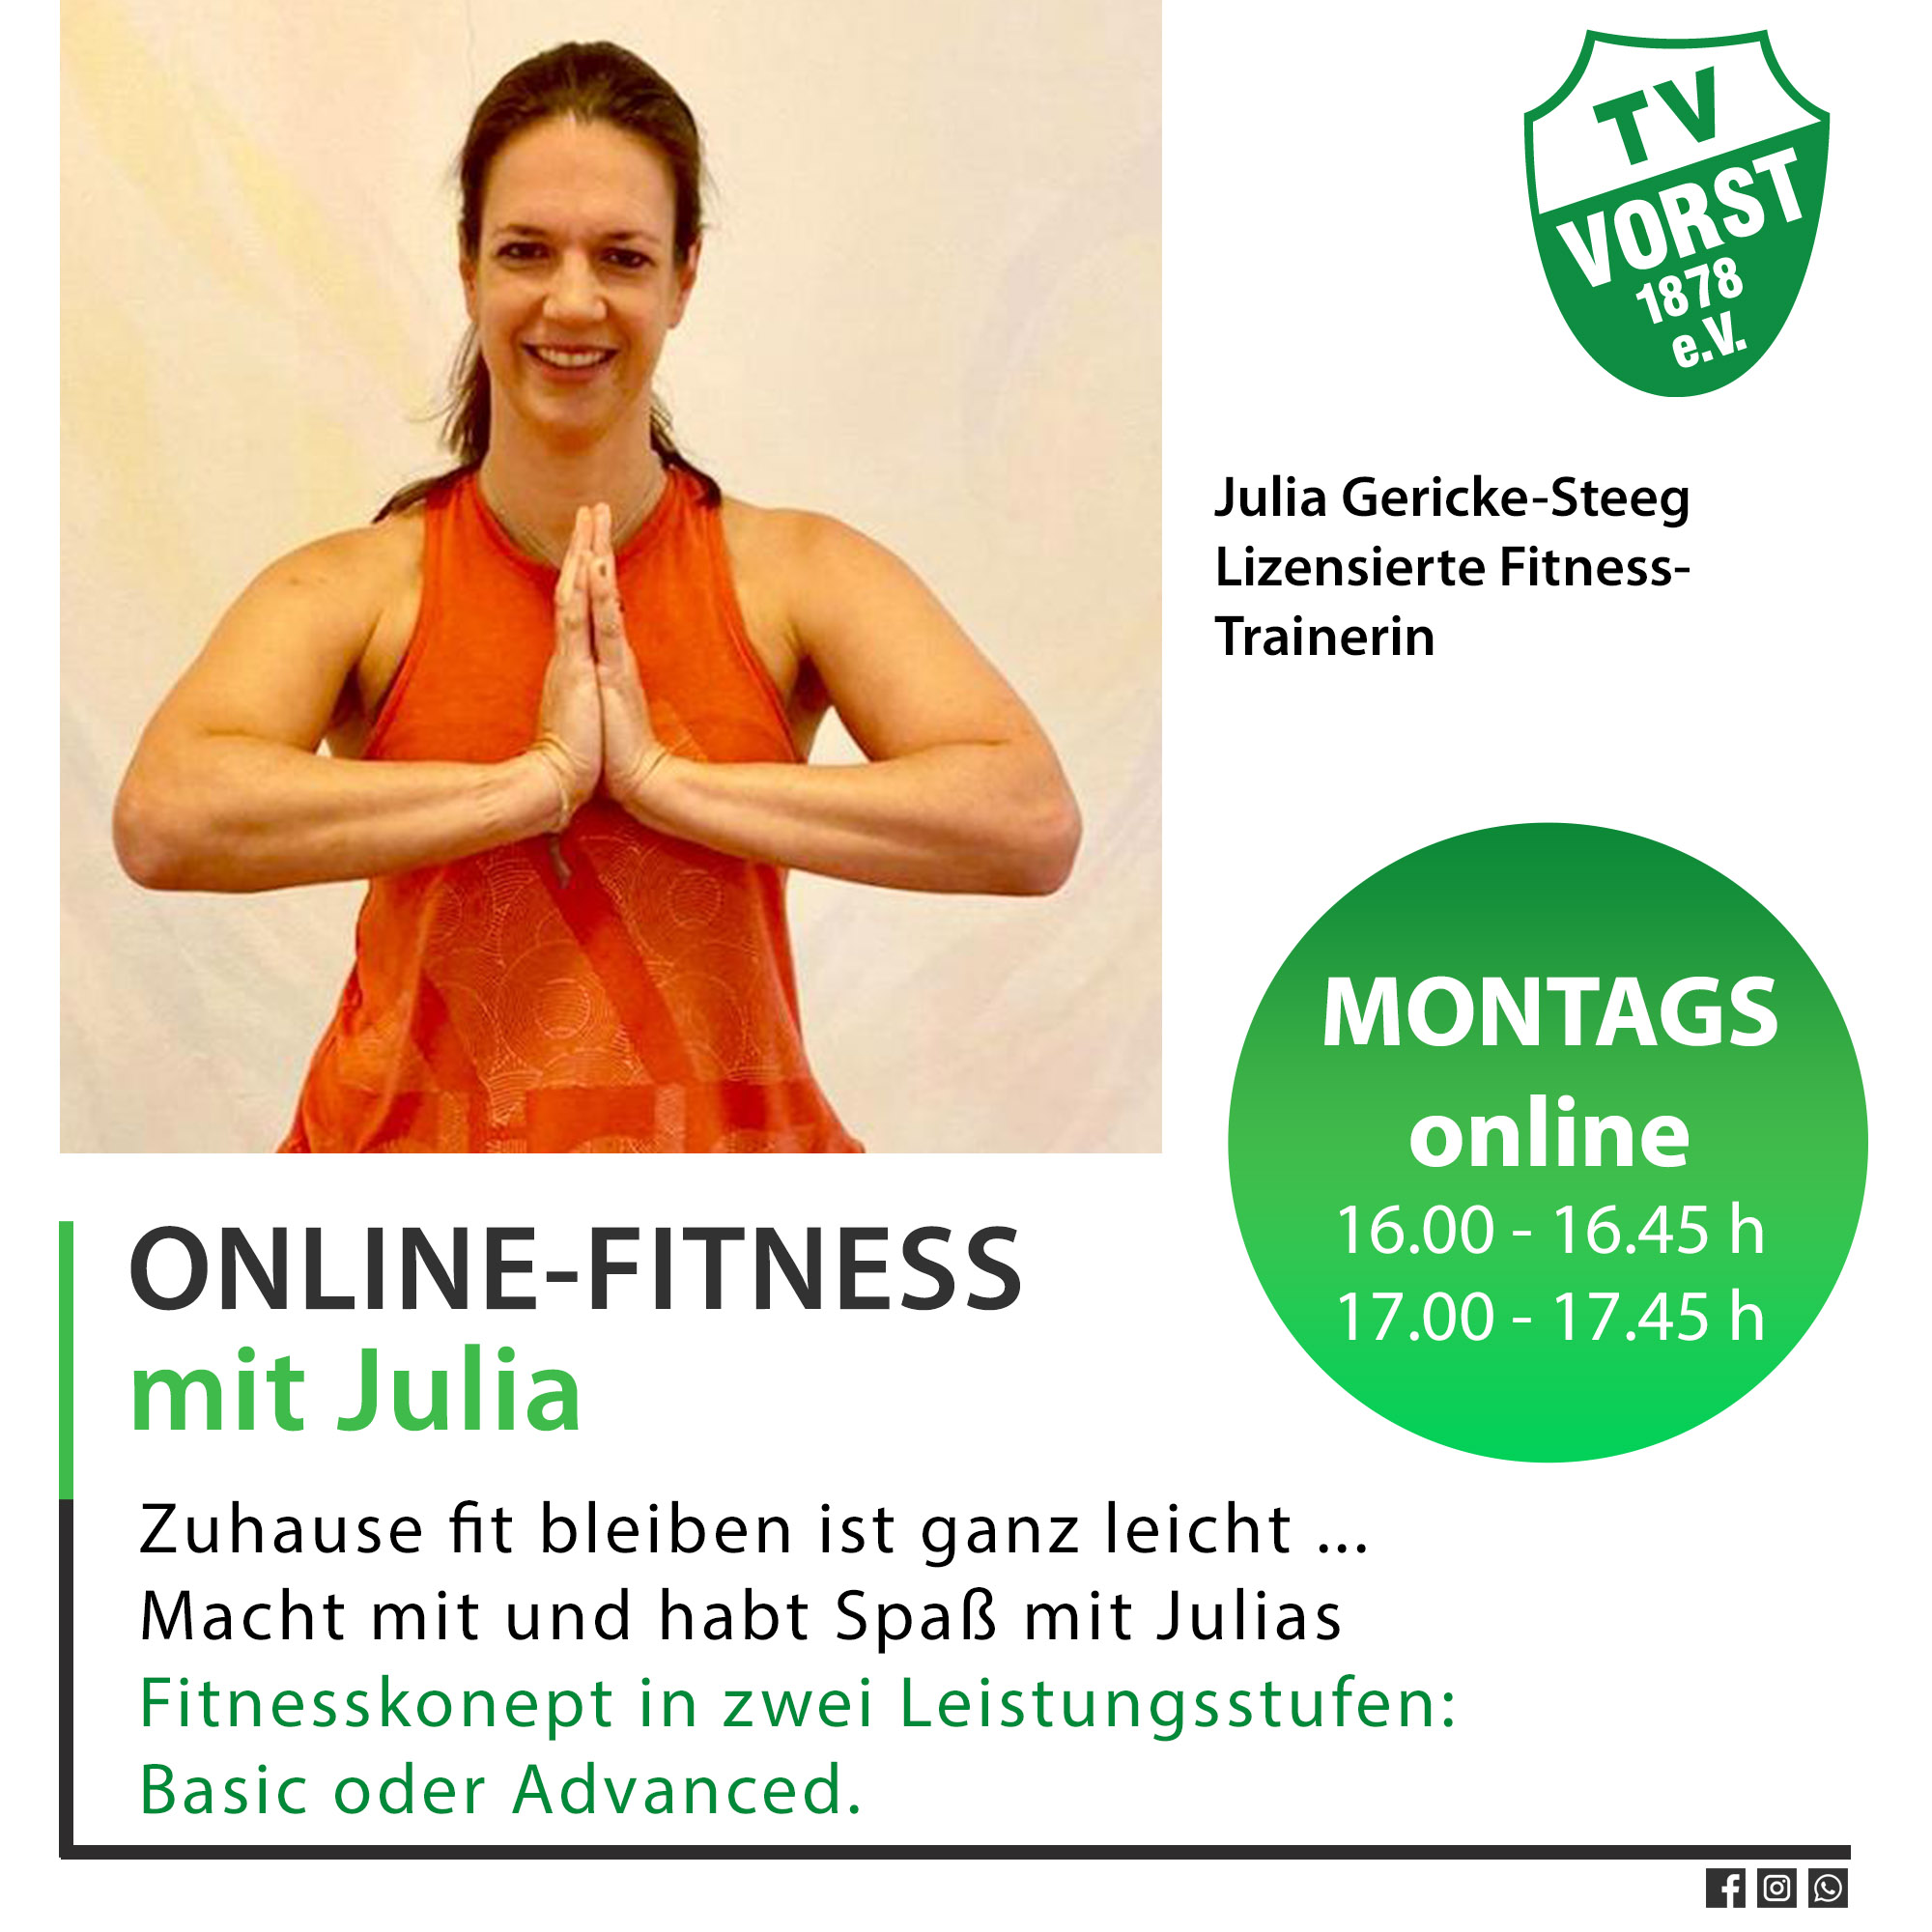 Online-Fitness mit Julia Gericke-Steeg